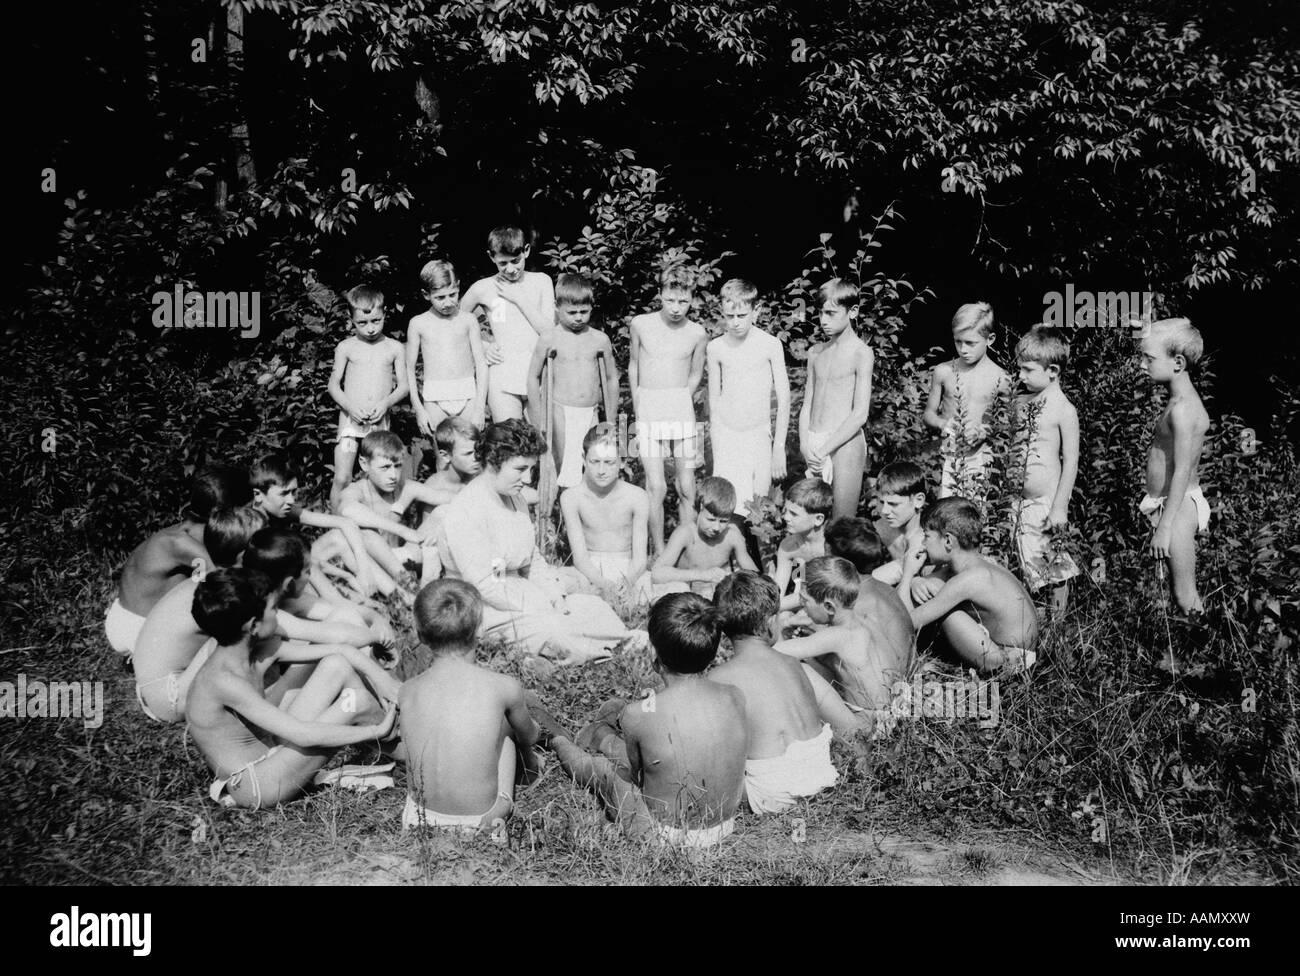 1920s 1930s PERRYSBURG NY SANITARIUM GROUP OF TUBERCULAR CHILDREN TAKING SUN AND OPEN AIR CURE TUBERCULOSIS - Stock Image